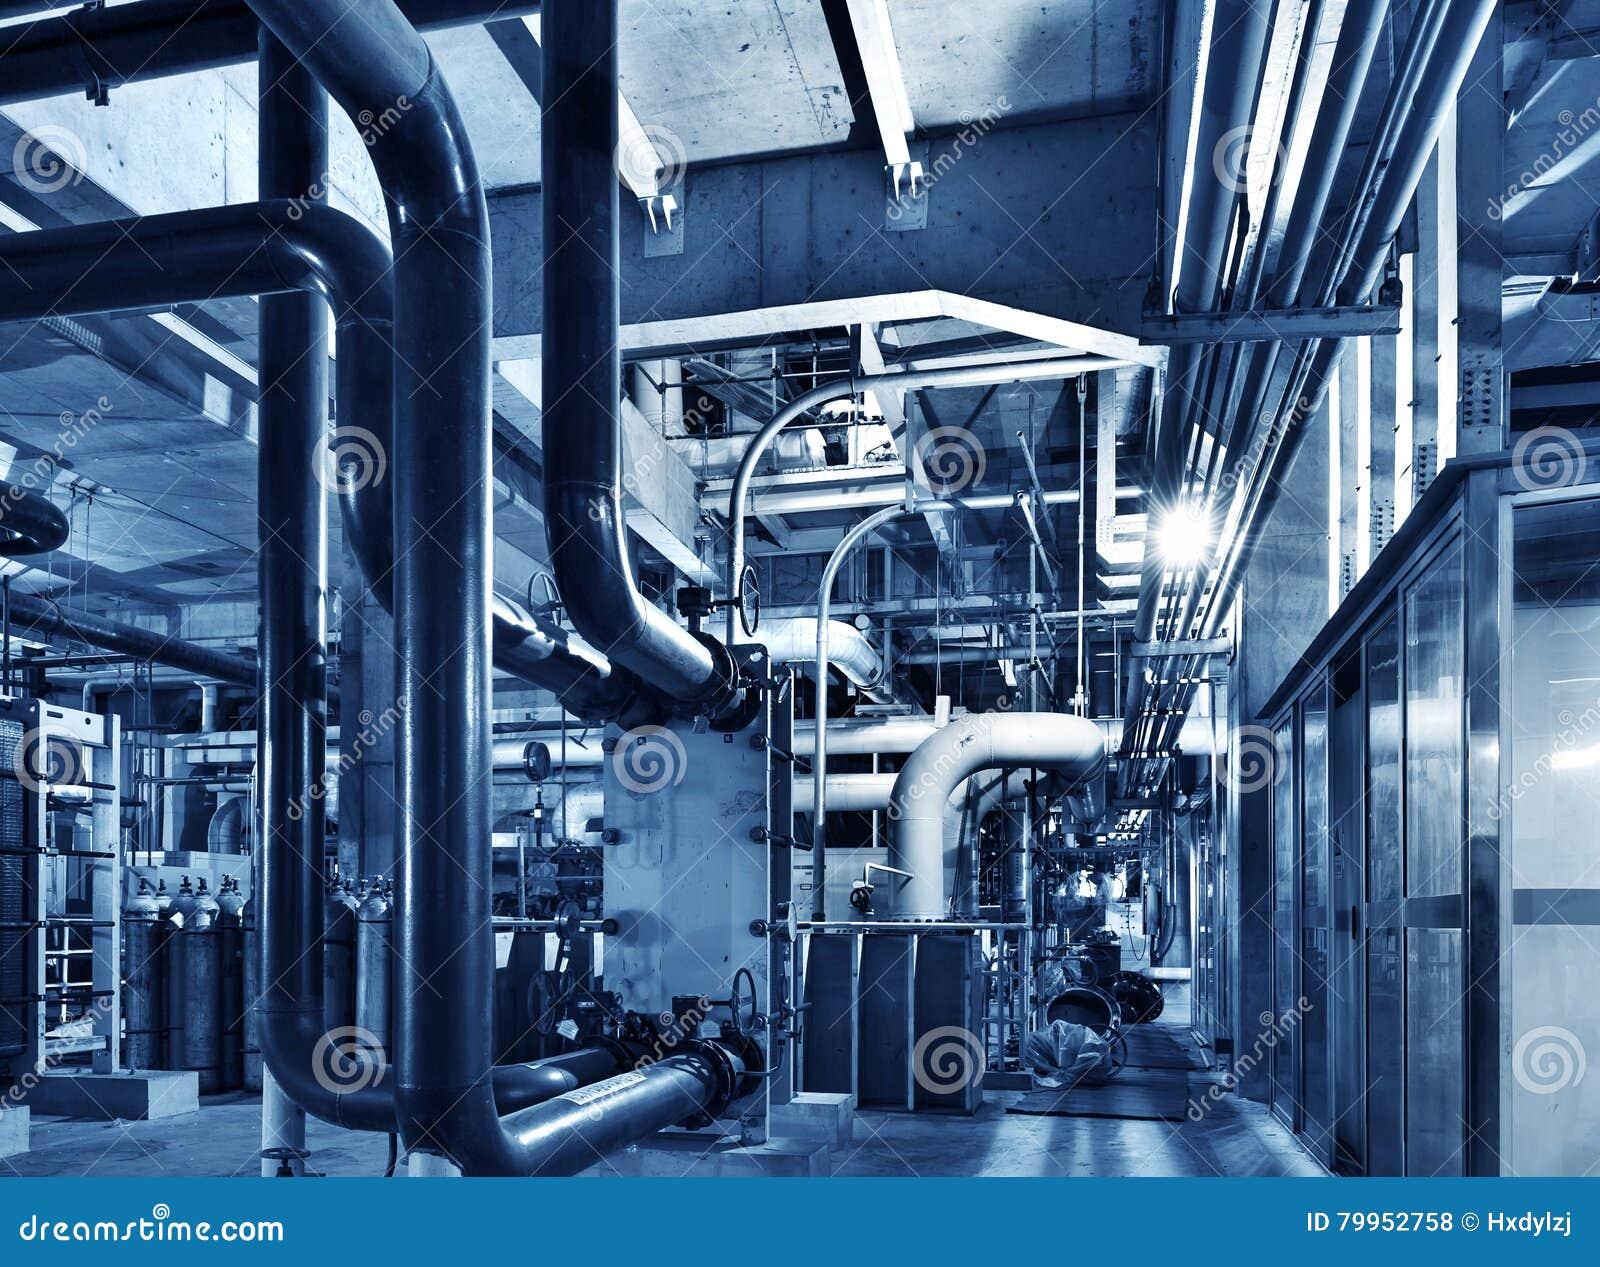 Modern Boiler Room Equipment For Heating System Stock Photo - Image ...